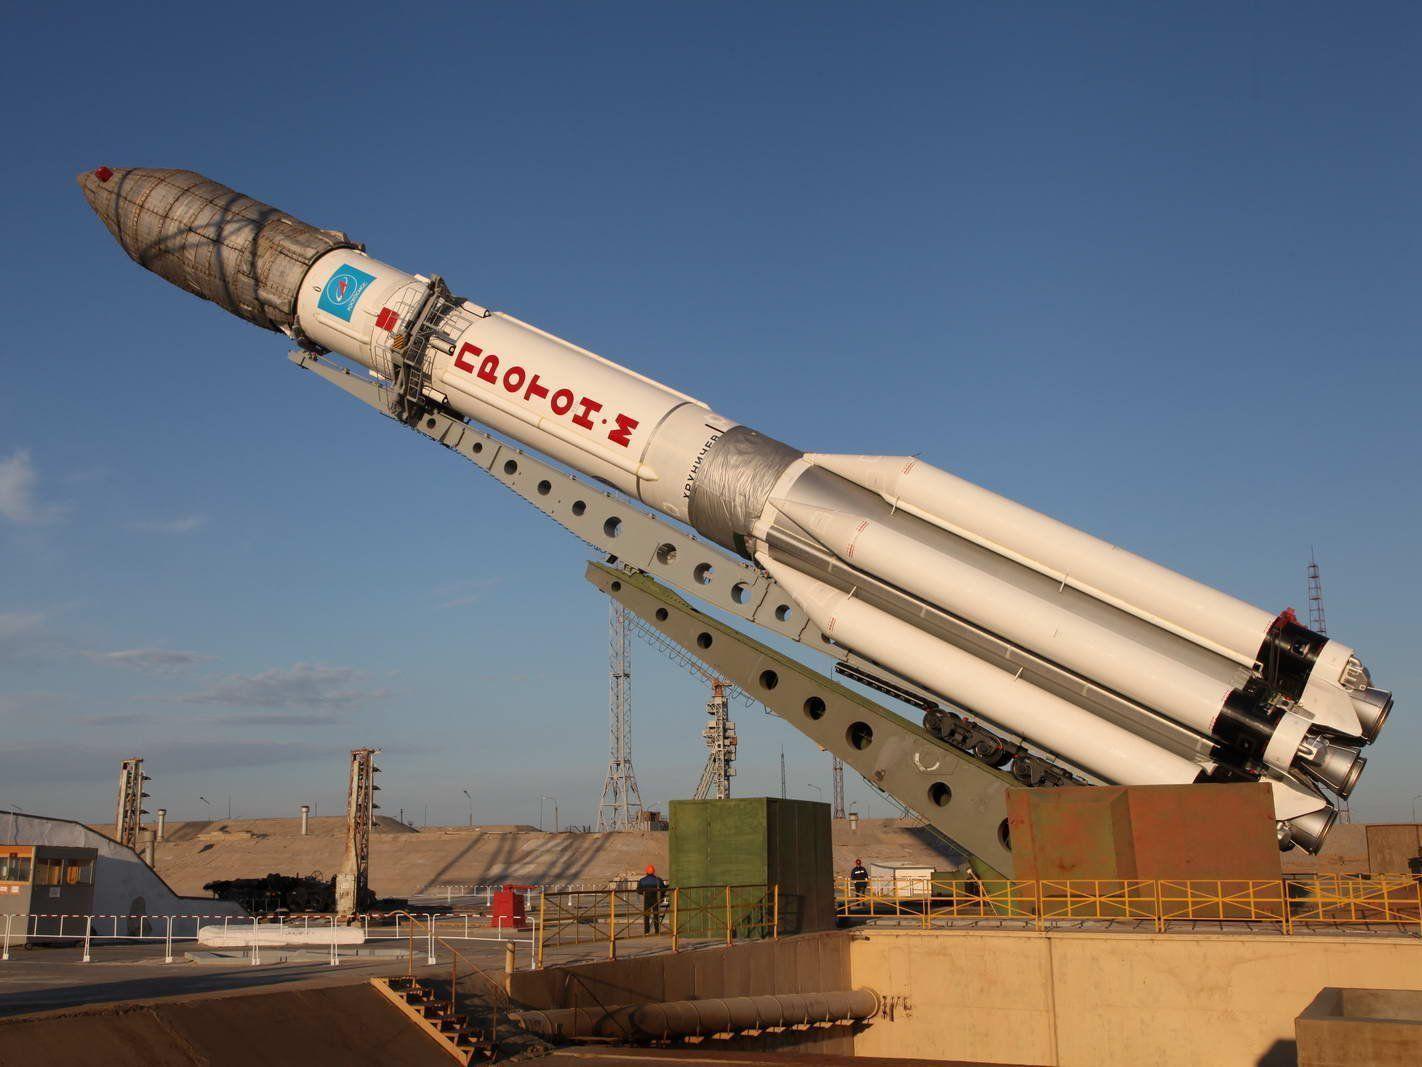 О том, как Центр Хруничева увел контракт у Space X